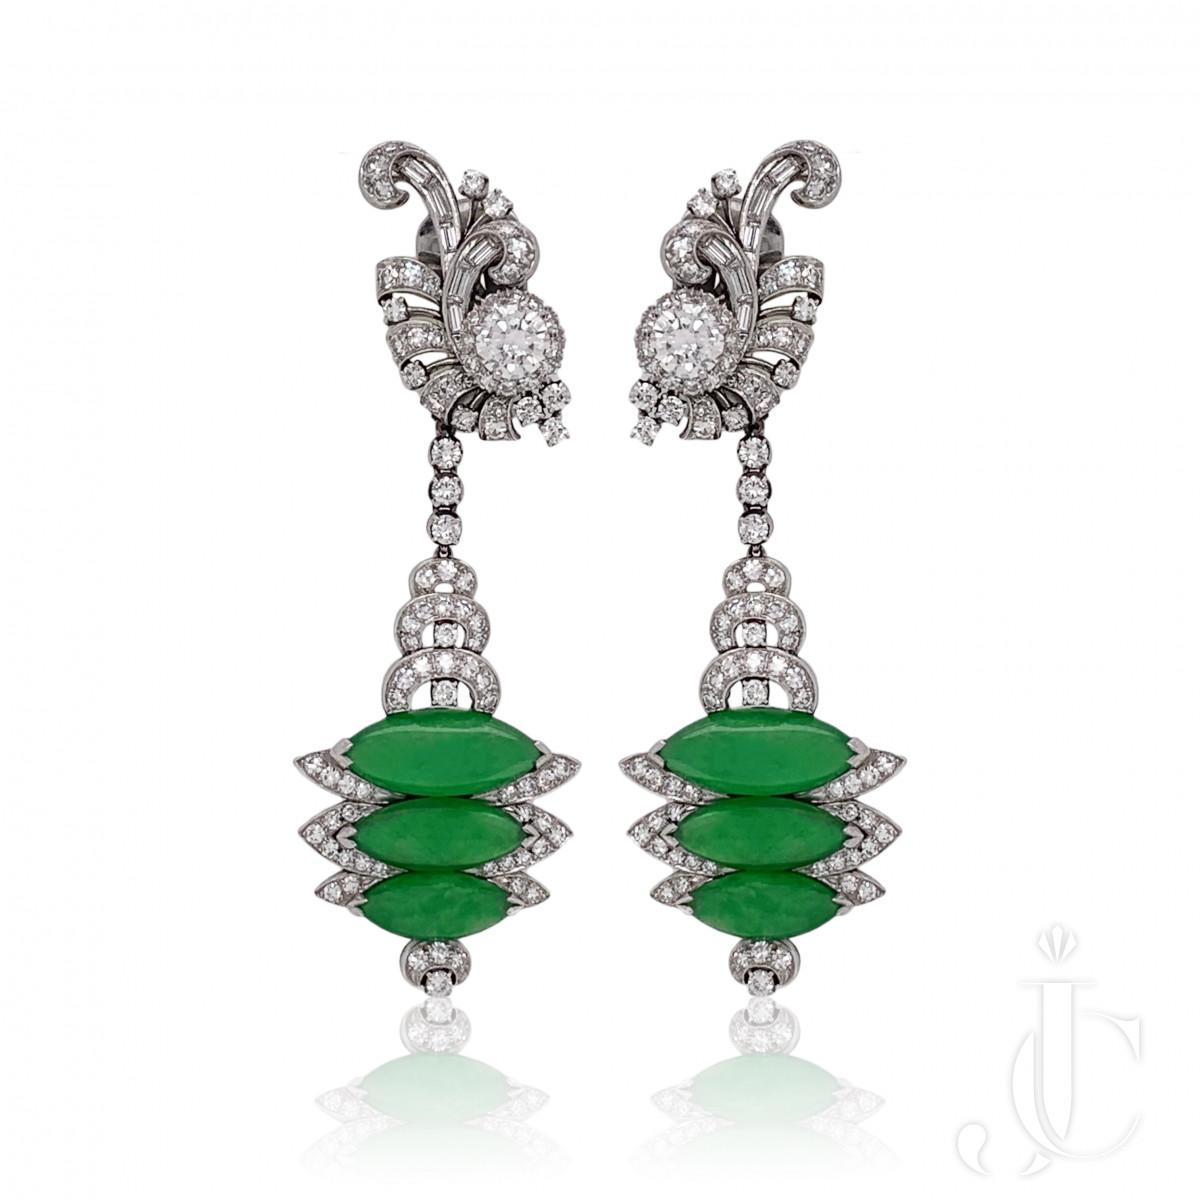 Spectacular Deco Jade Diamond Earrings